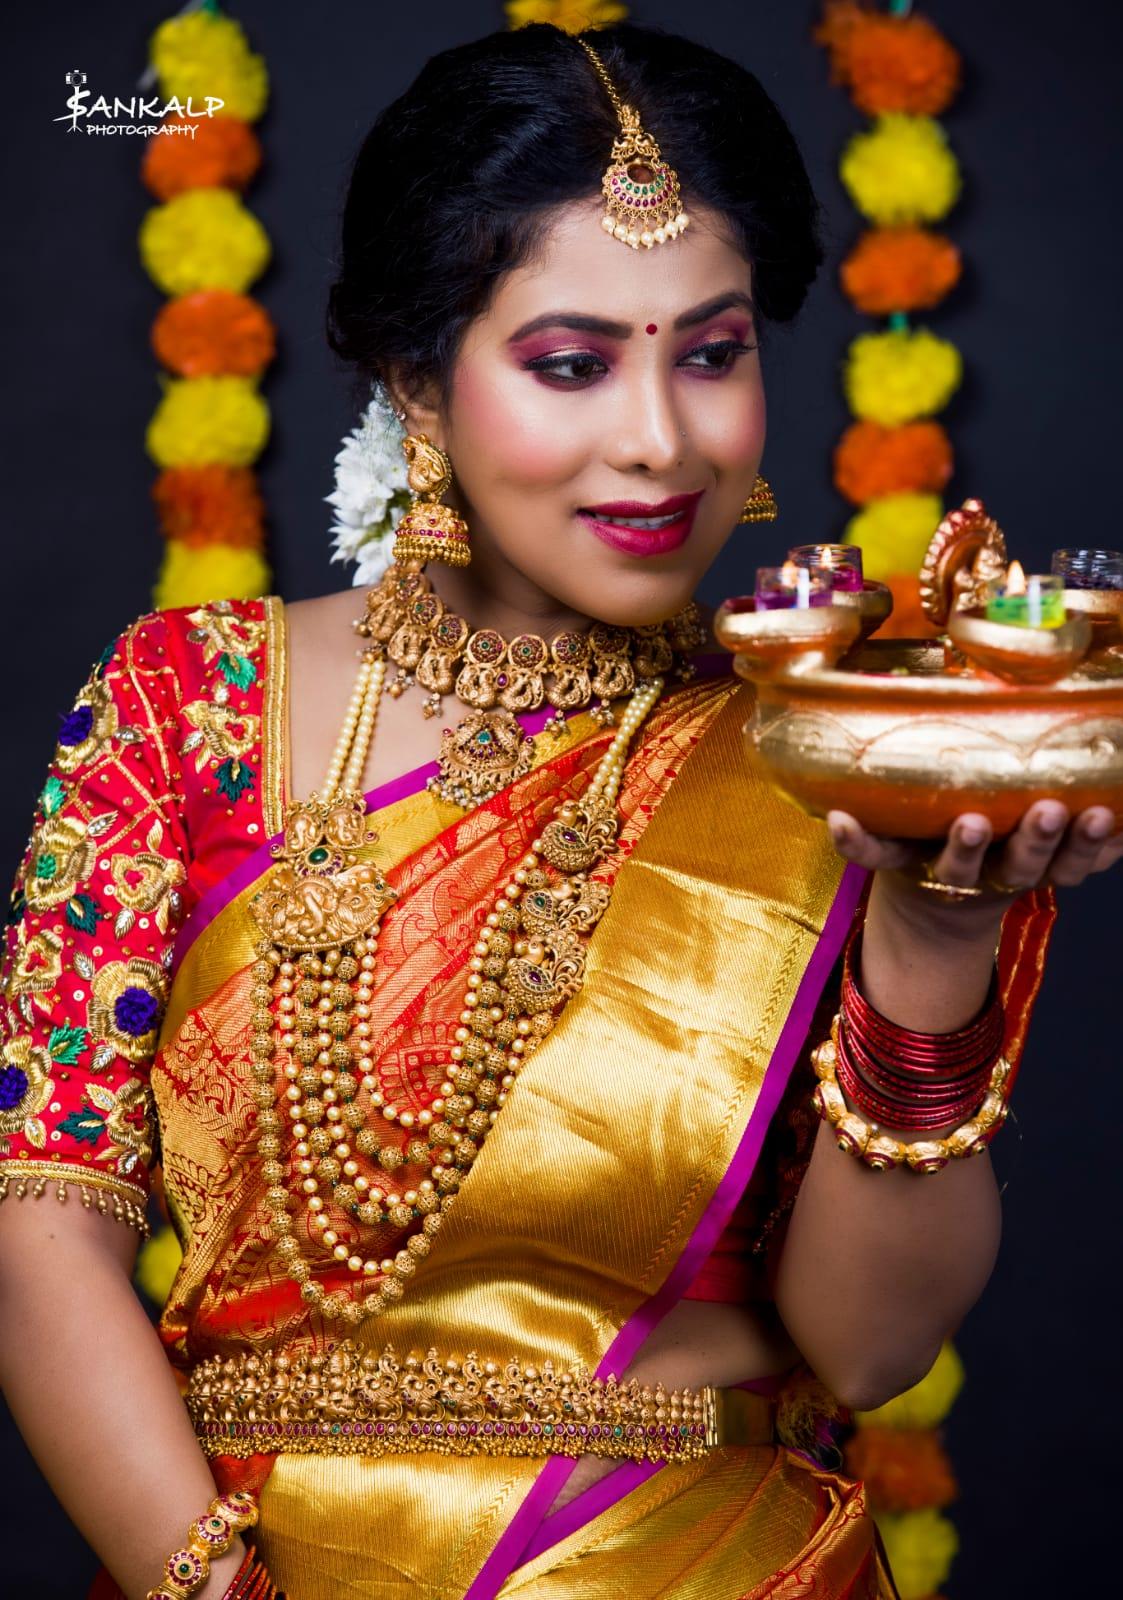 lakshmi-makeup-artist-bangalore-olready